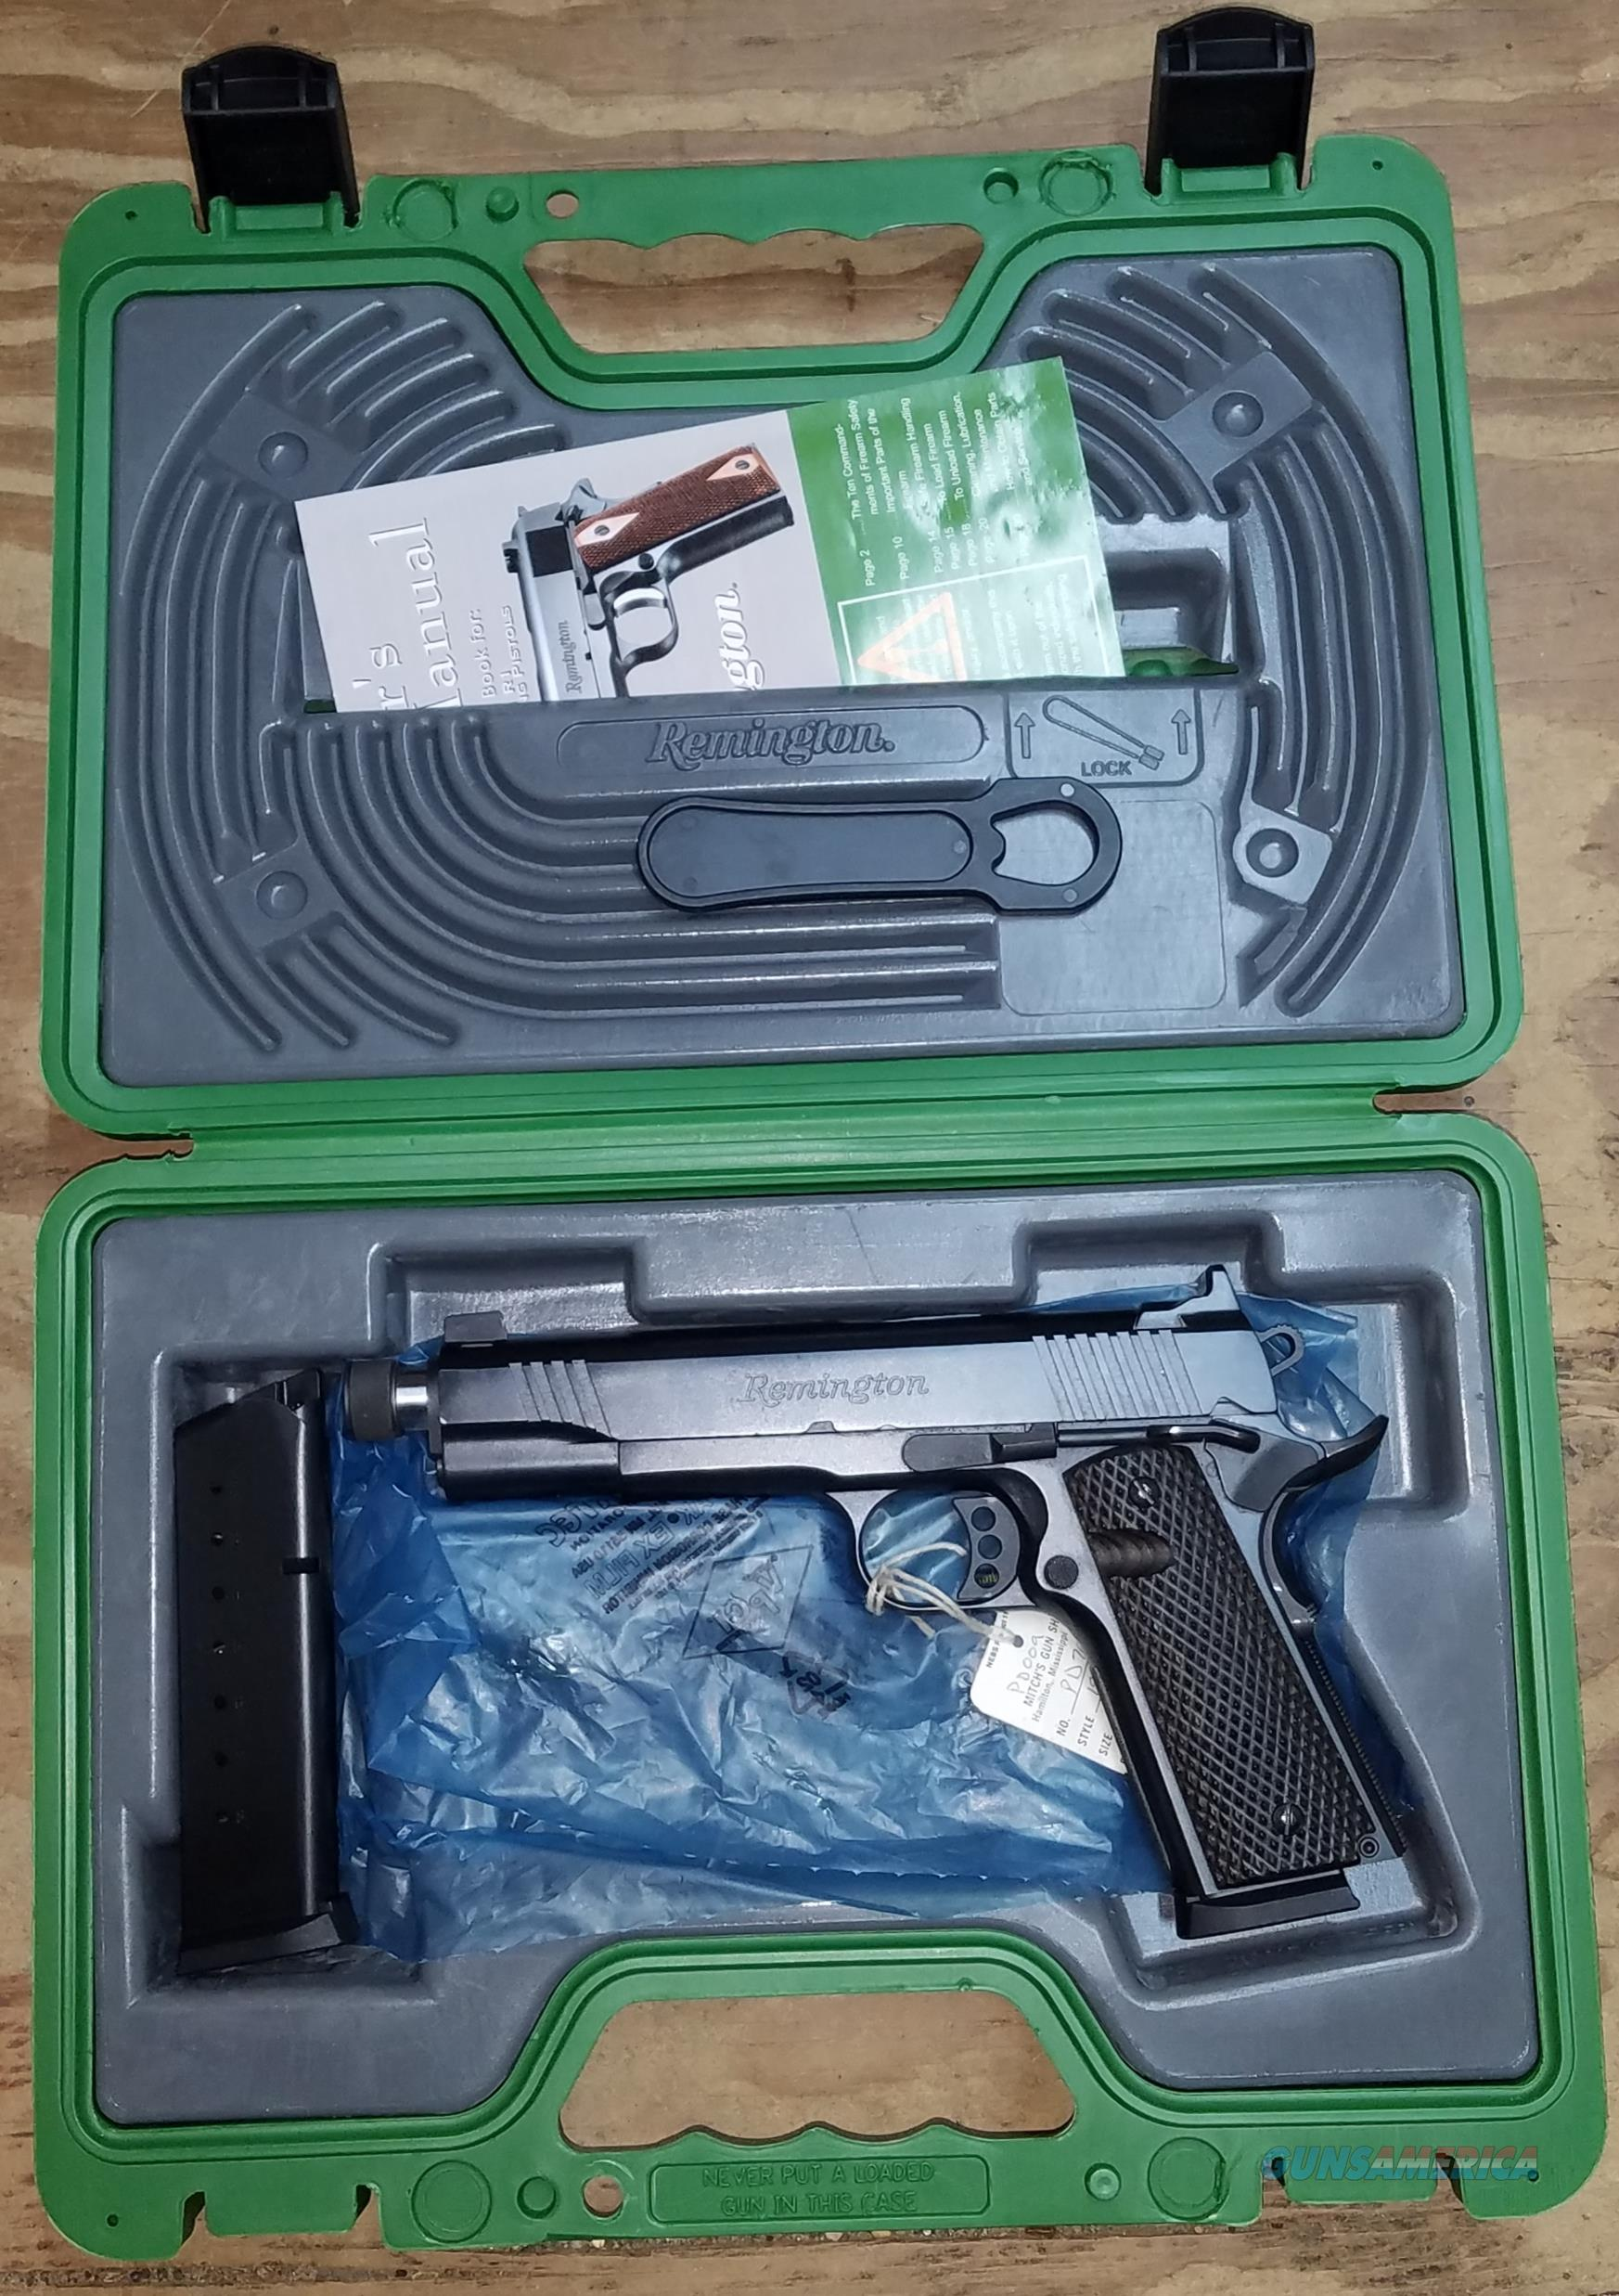 Remington 1911 R1 Enhanced Black .45 ACP 96339  Guns > Pistols > Remington Pistols - Modern > 1911